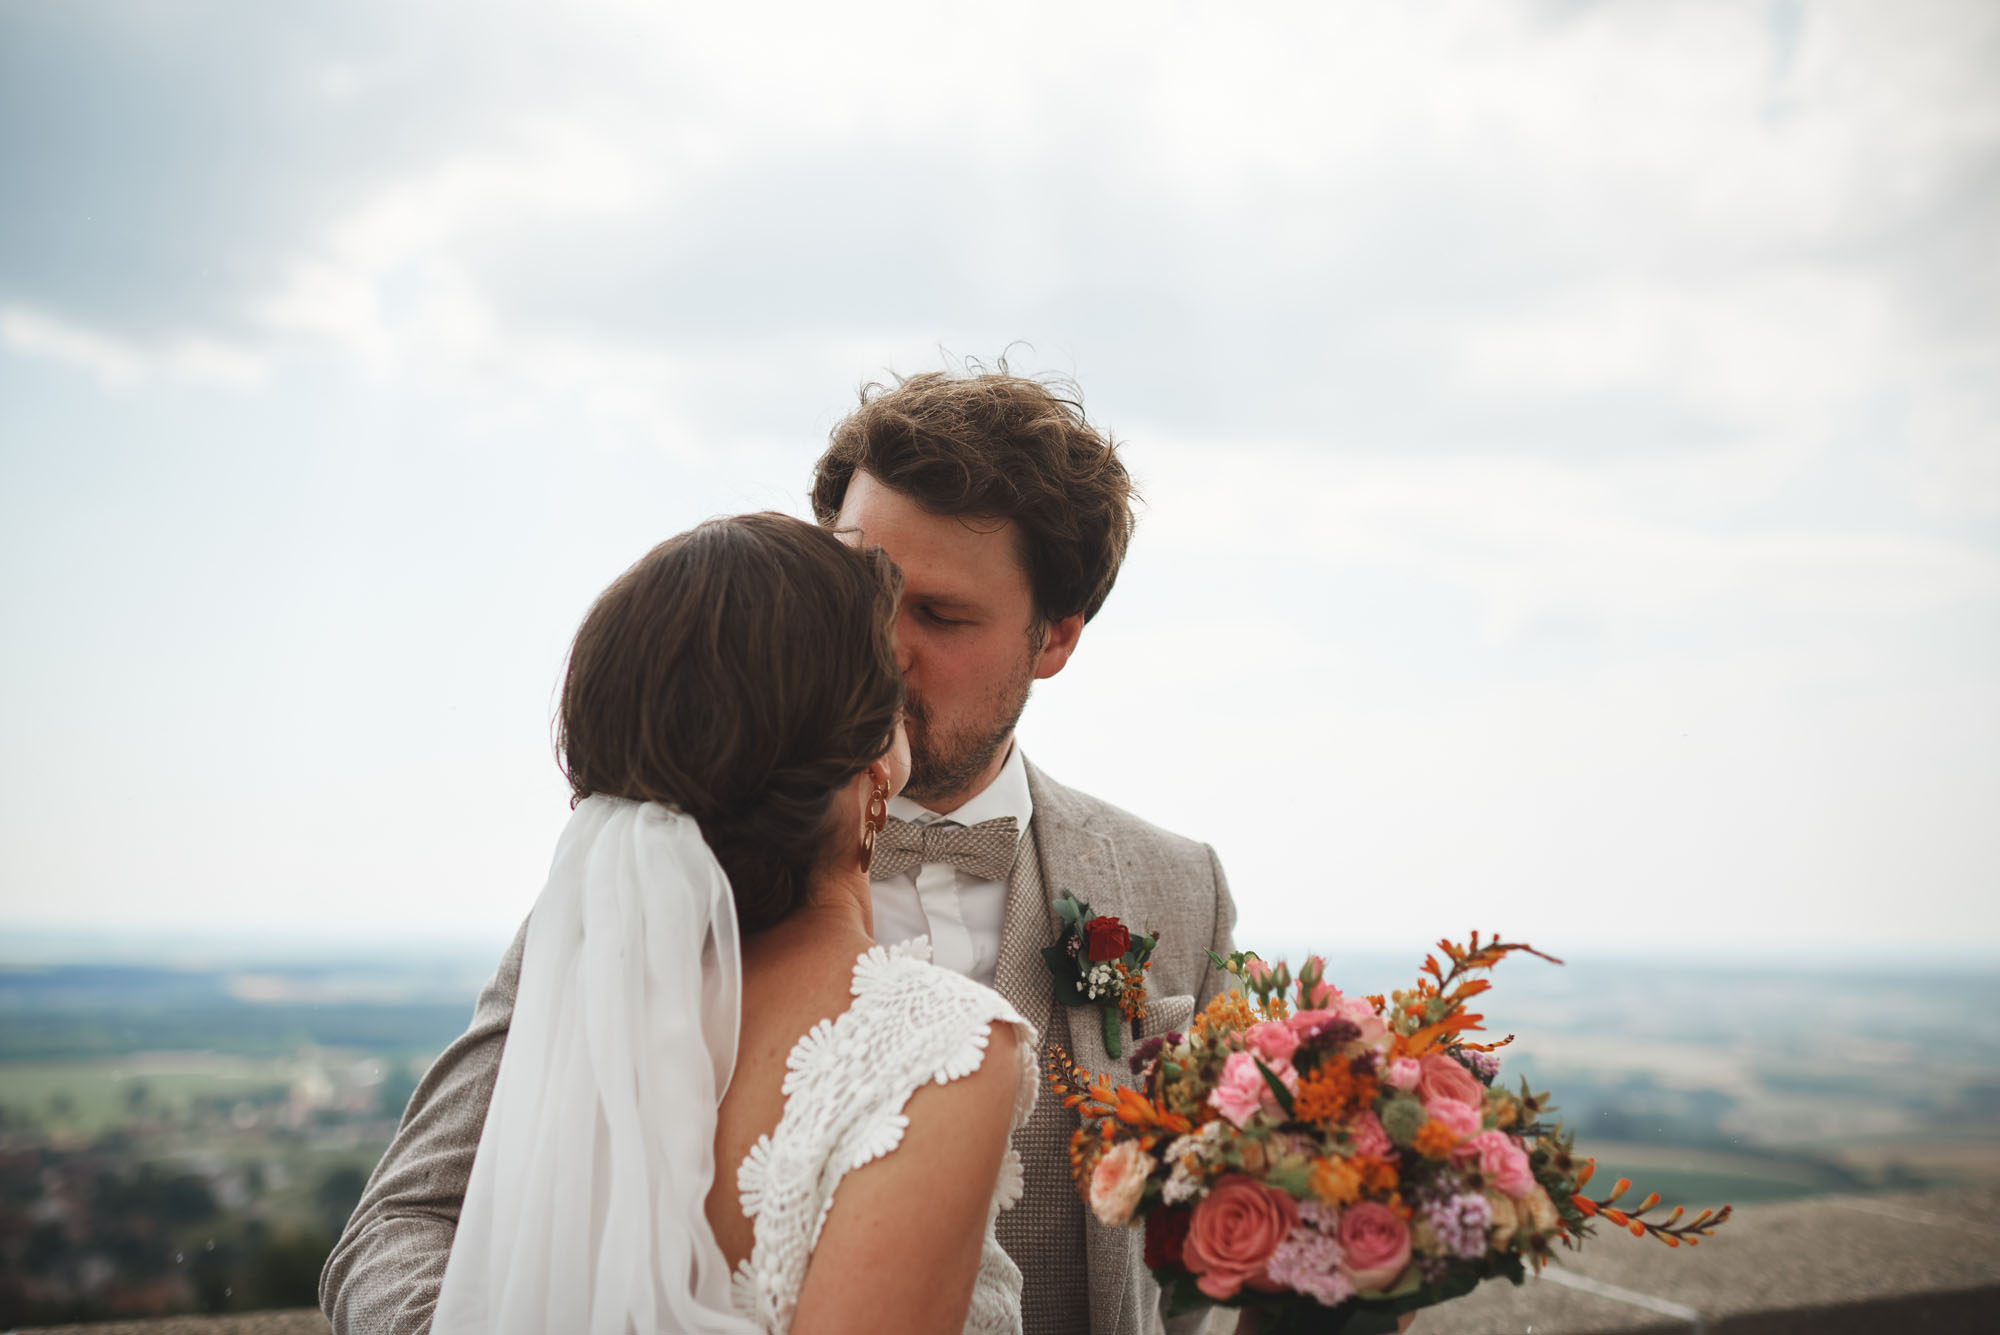 Martin Spoerl Potography Hochzeit Ailinger Muehle 0014